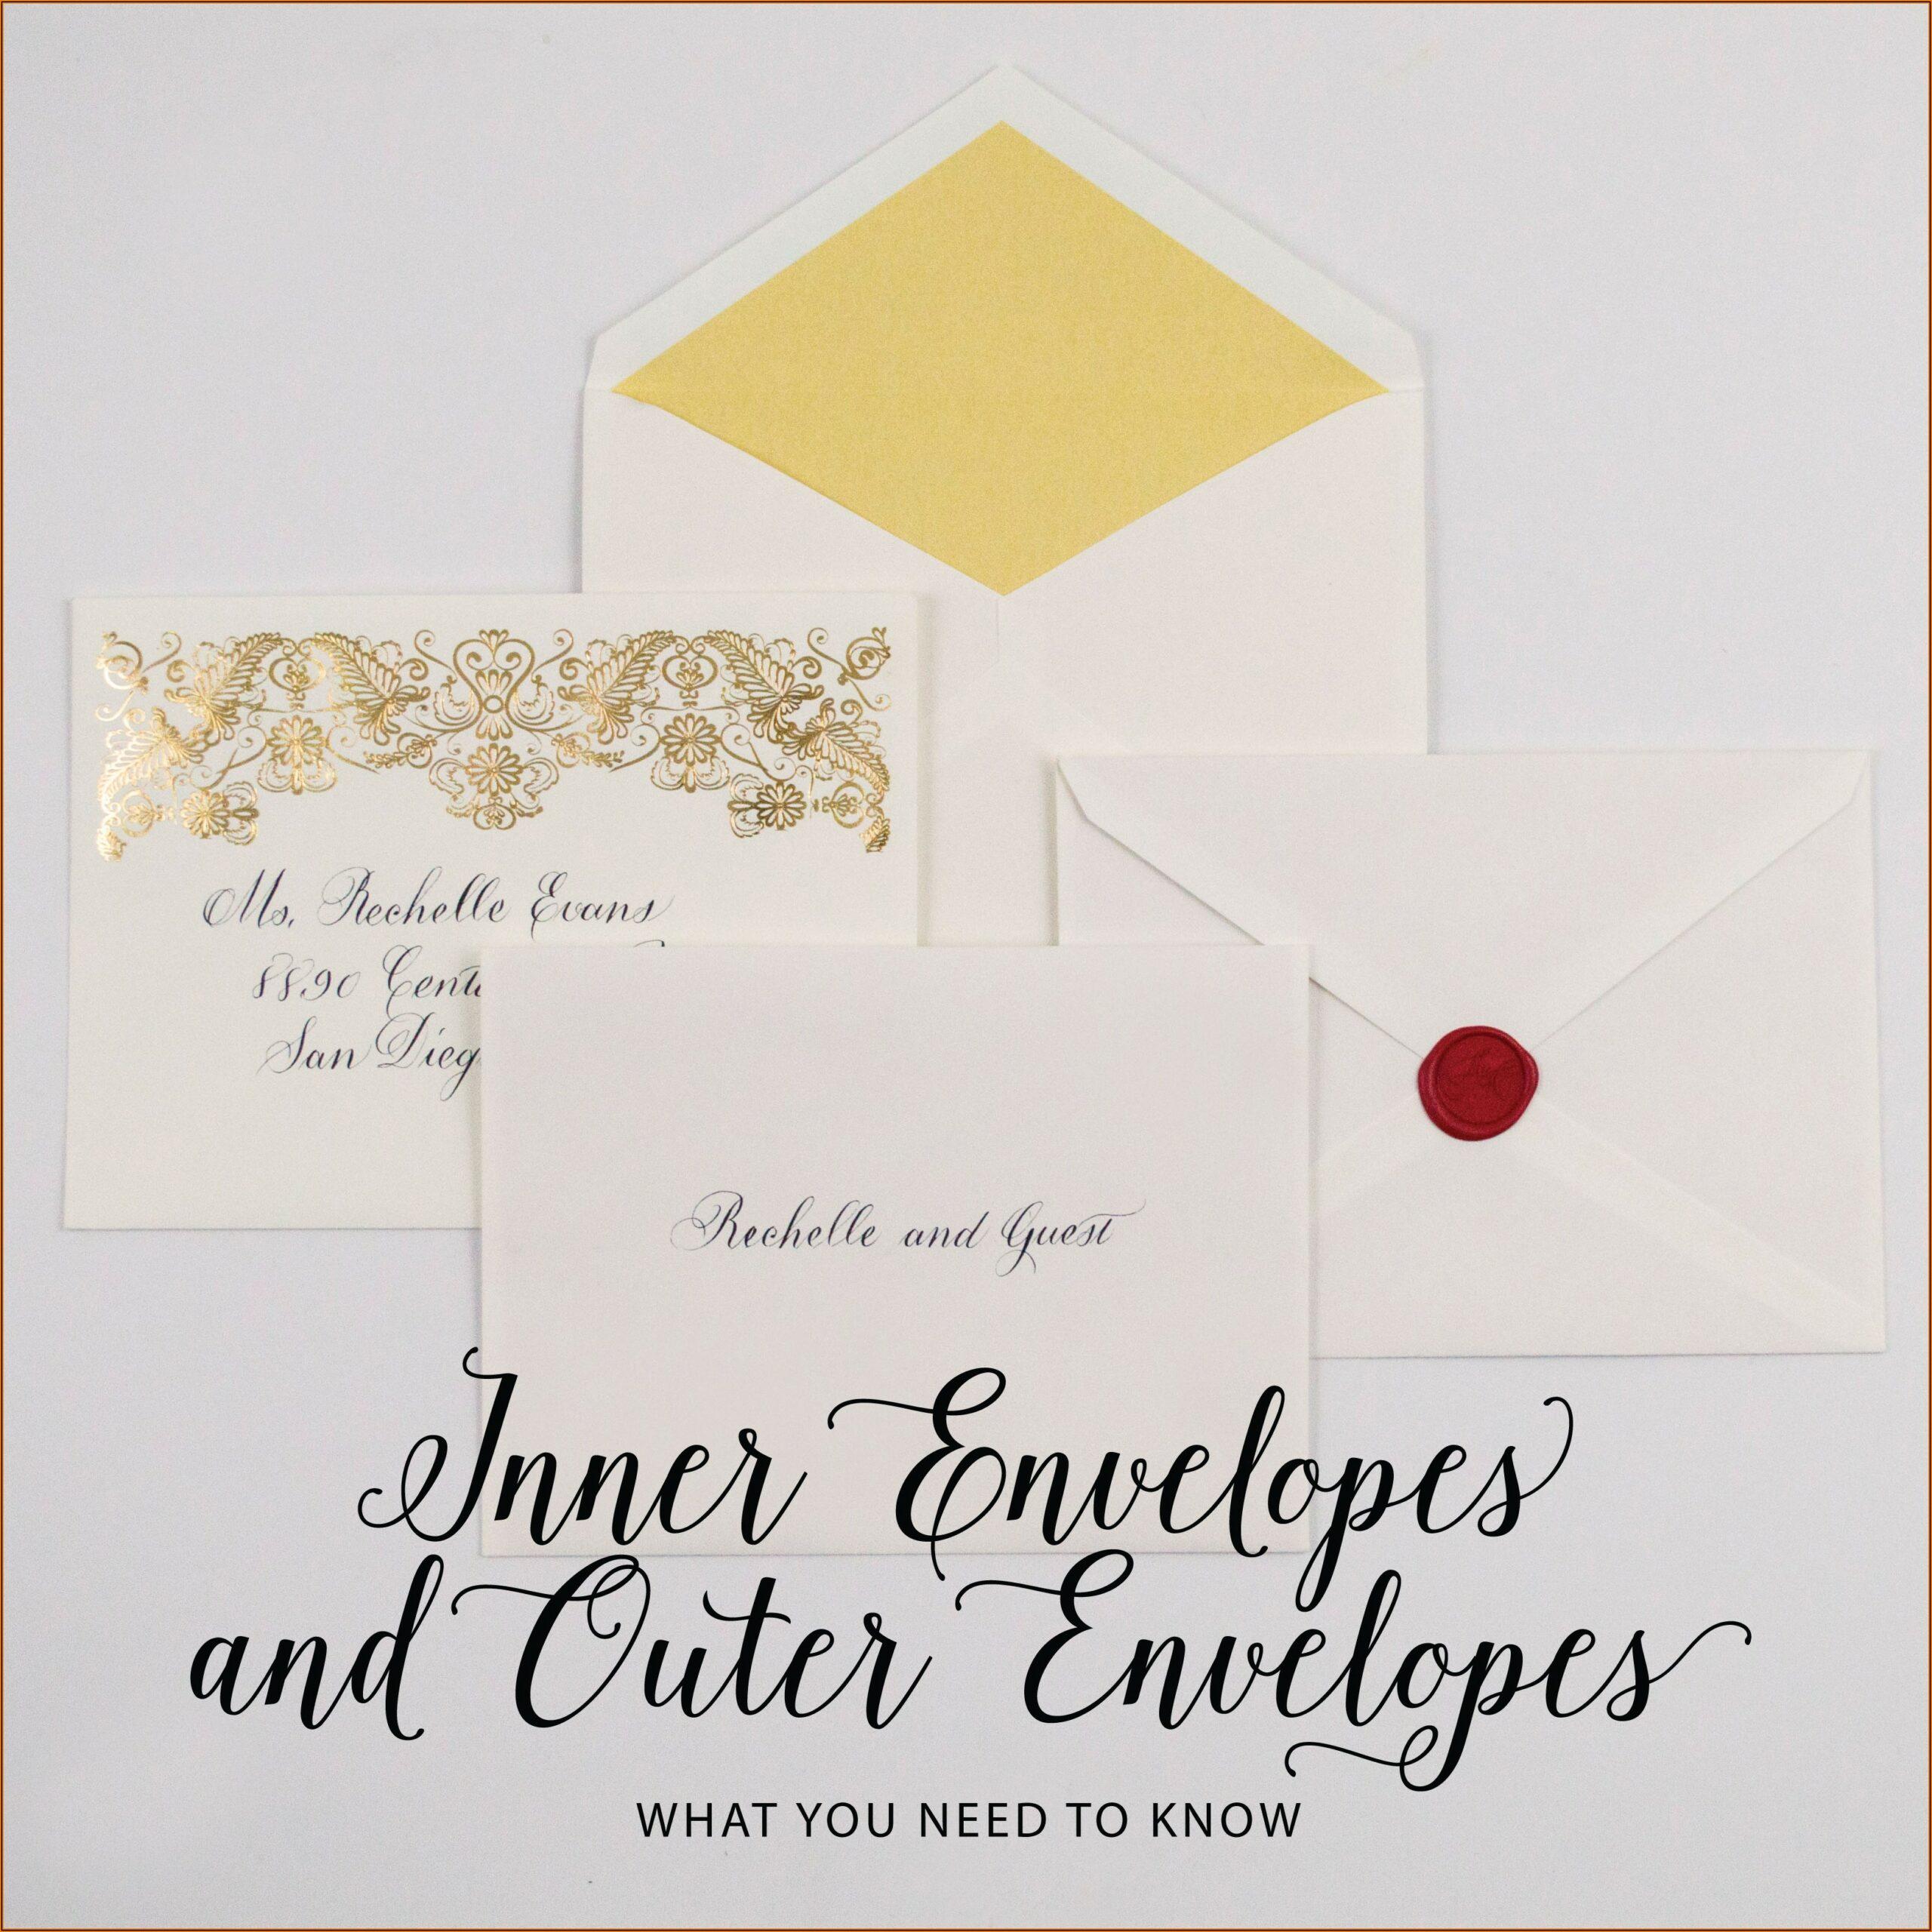 No Inner Envelope Wedding Invitation Etiquette